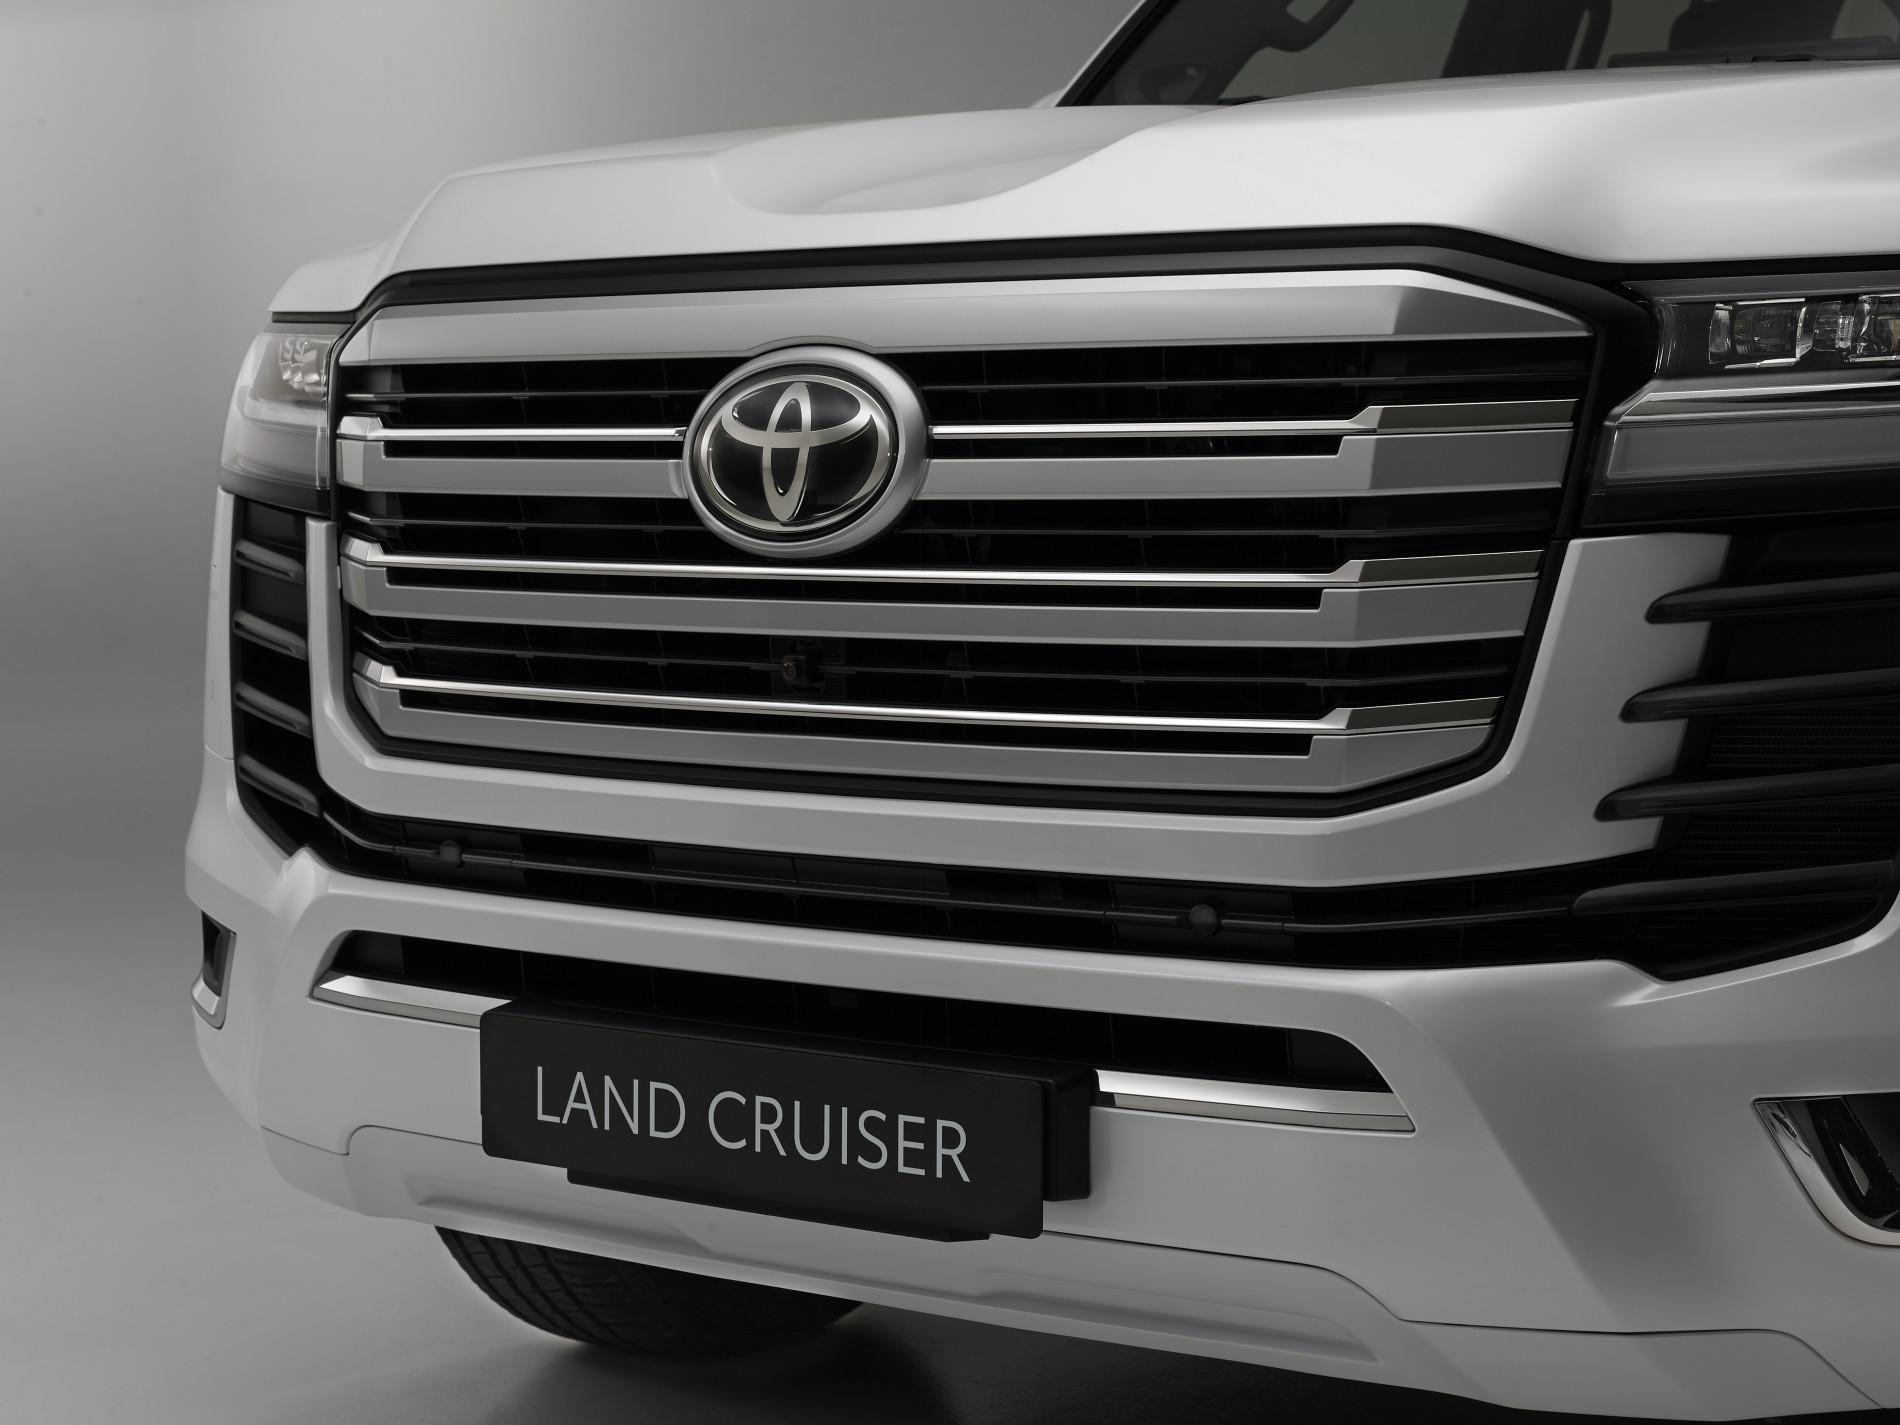 Toyota Land Cruiser 300 - Toyota Land Cruiser 300